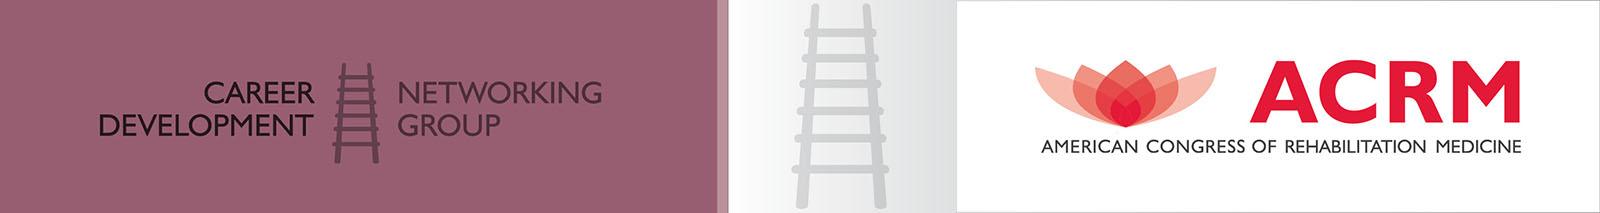 Career Development Networking Group